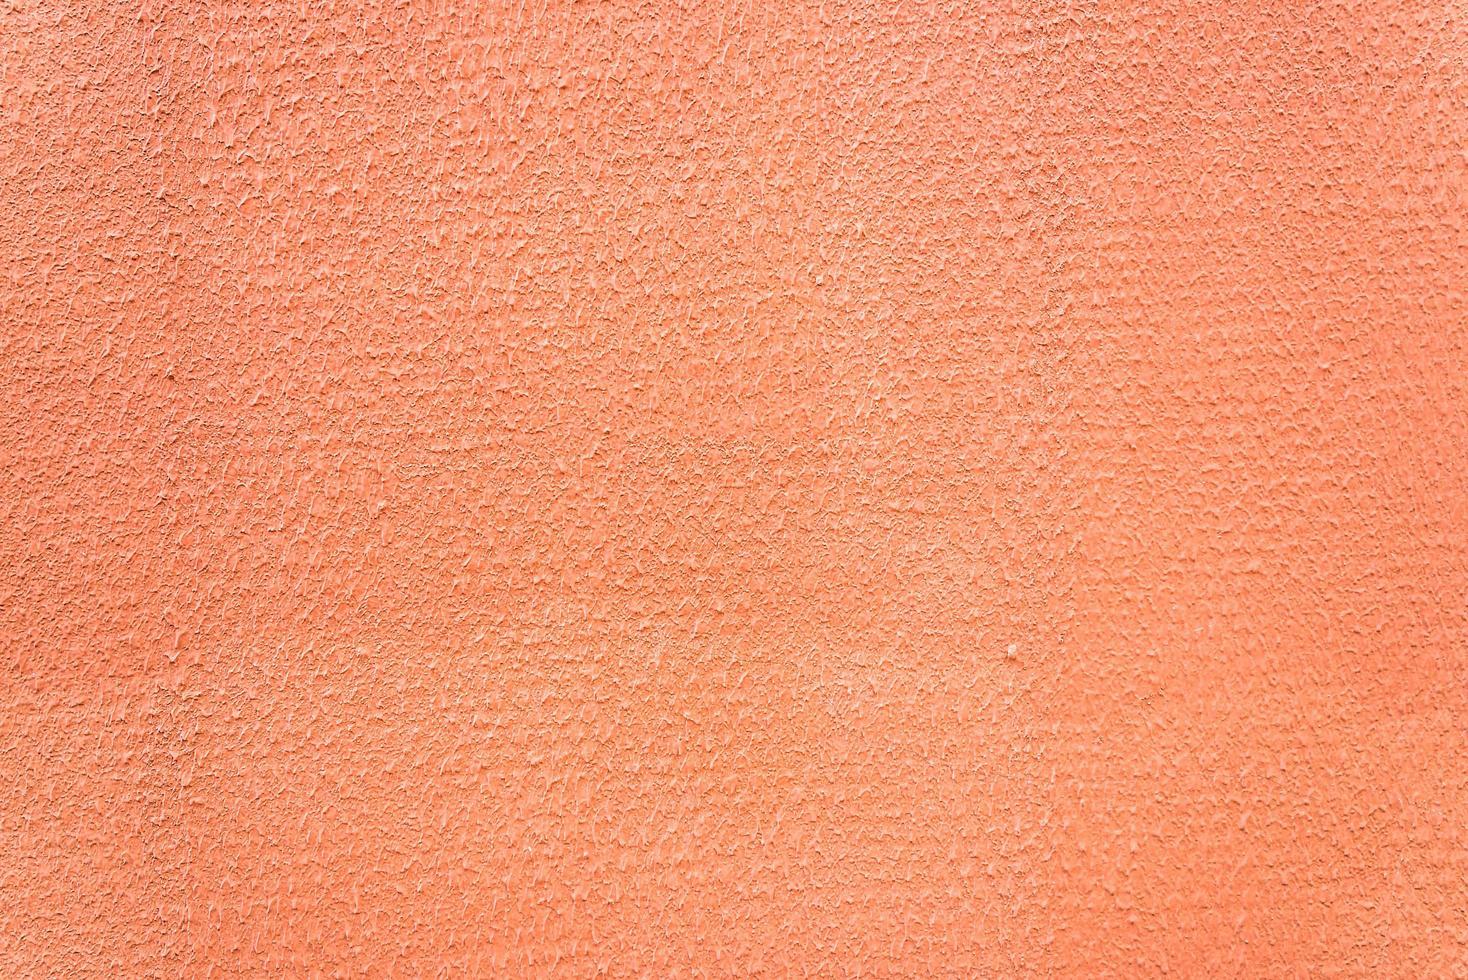 oranje concrete achtergrond foto